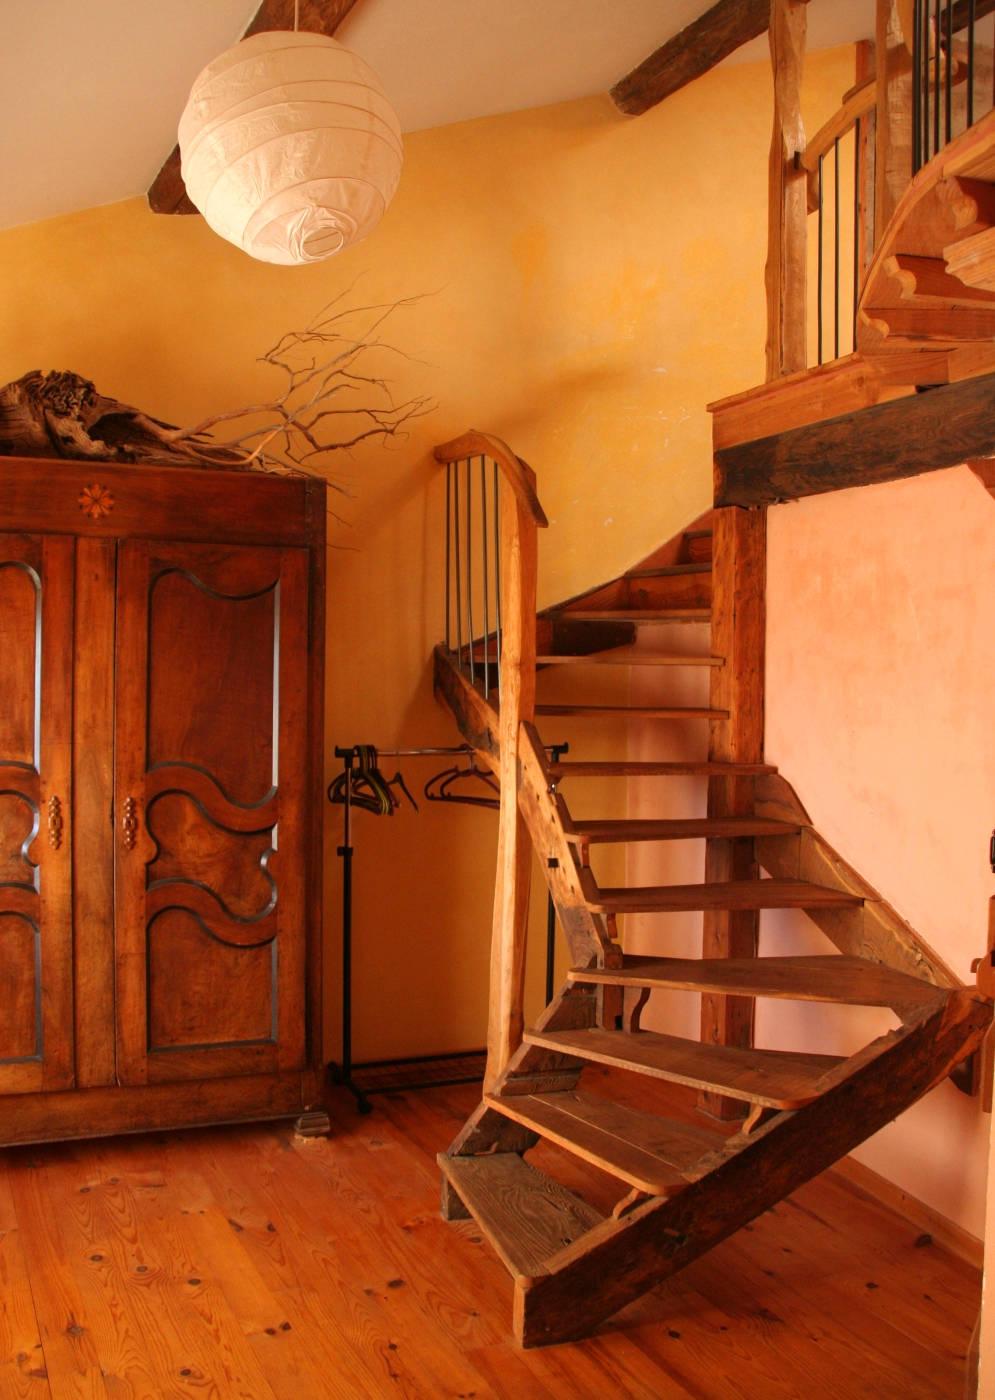 cecile_escalier_compress.jpg